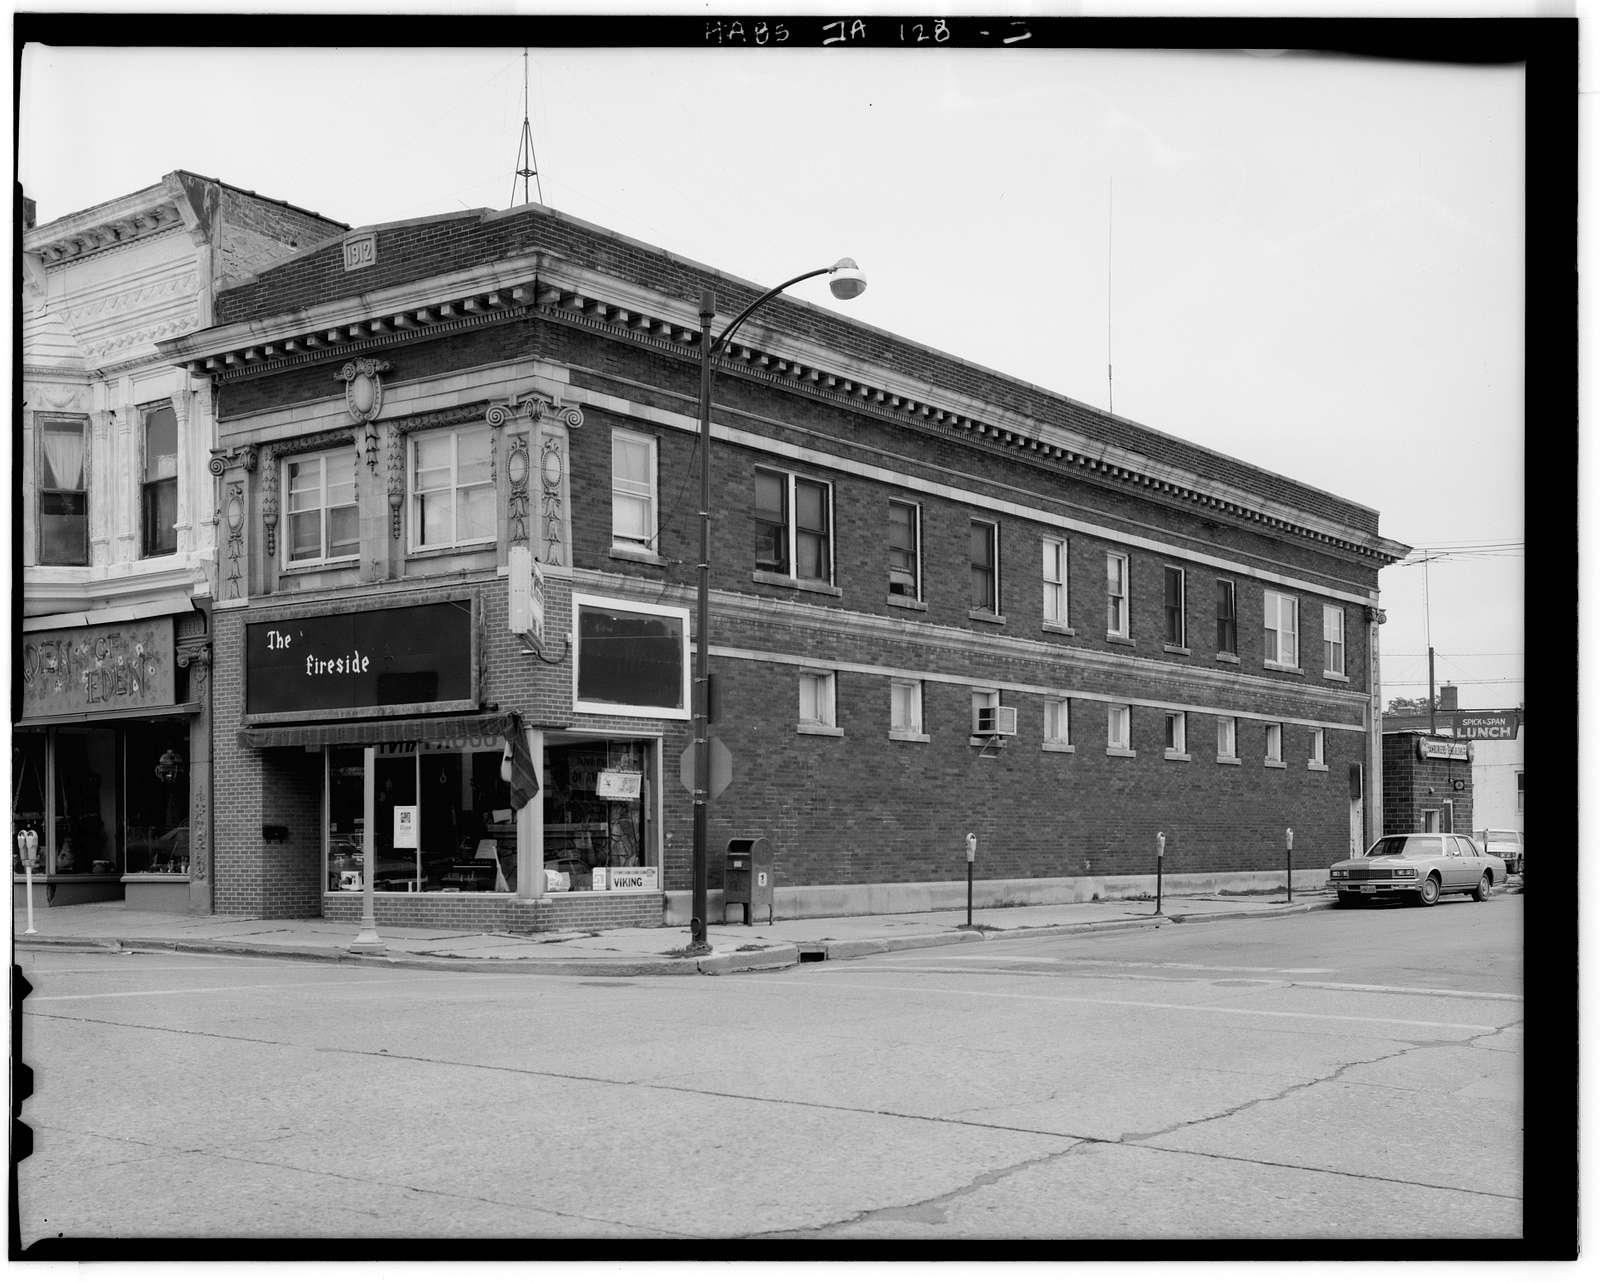 W. T. McFarlane Building, 123 South Federal Avenue, Mason City, Cerro Gordo County, IA